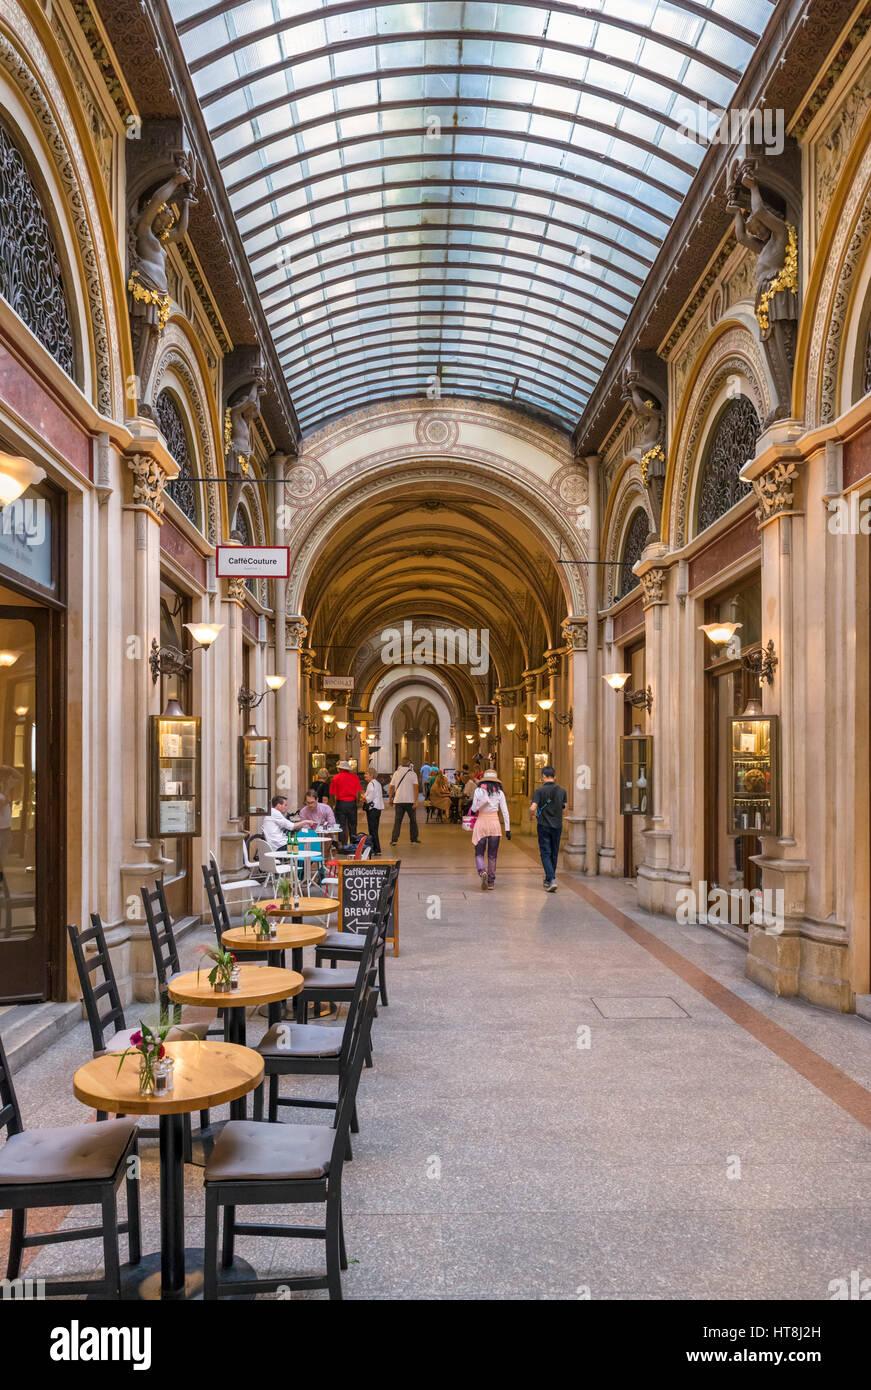 Vienna. Cafe and shops in the Freyung Passage, Palais Ferstel, Innere Stadt, Vienna, Austria - Stock Image